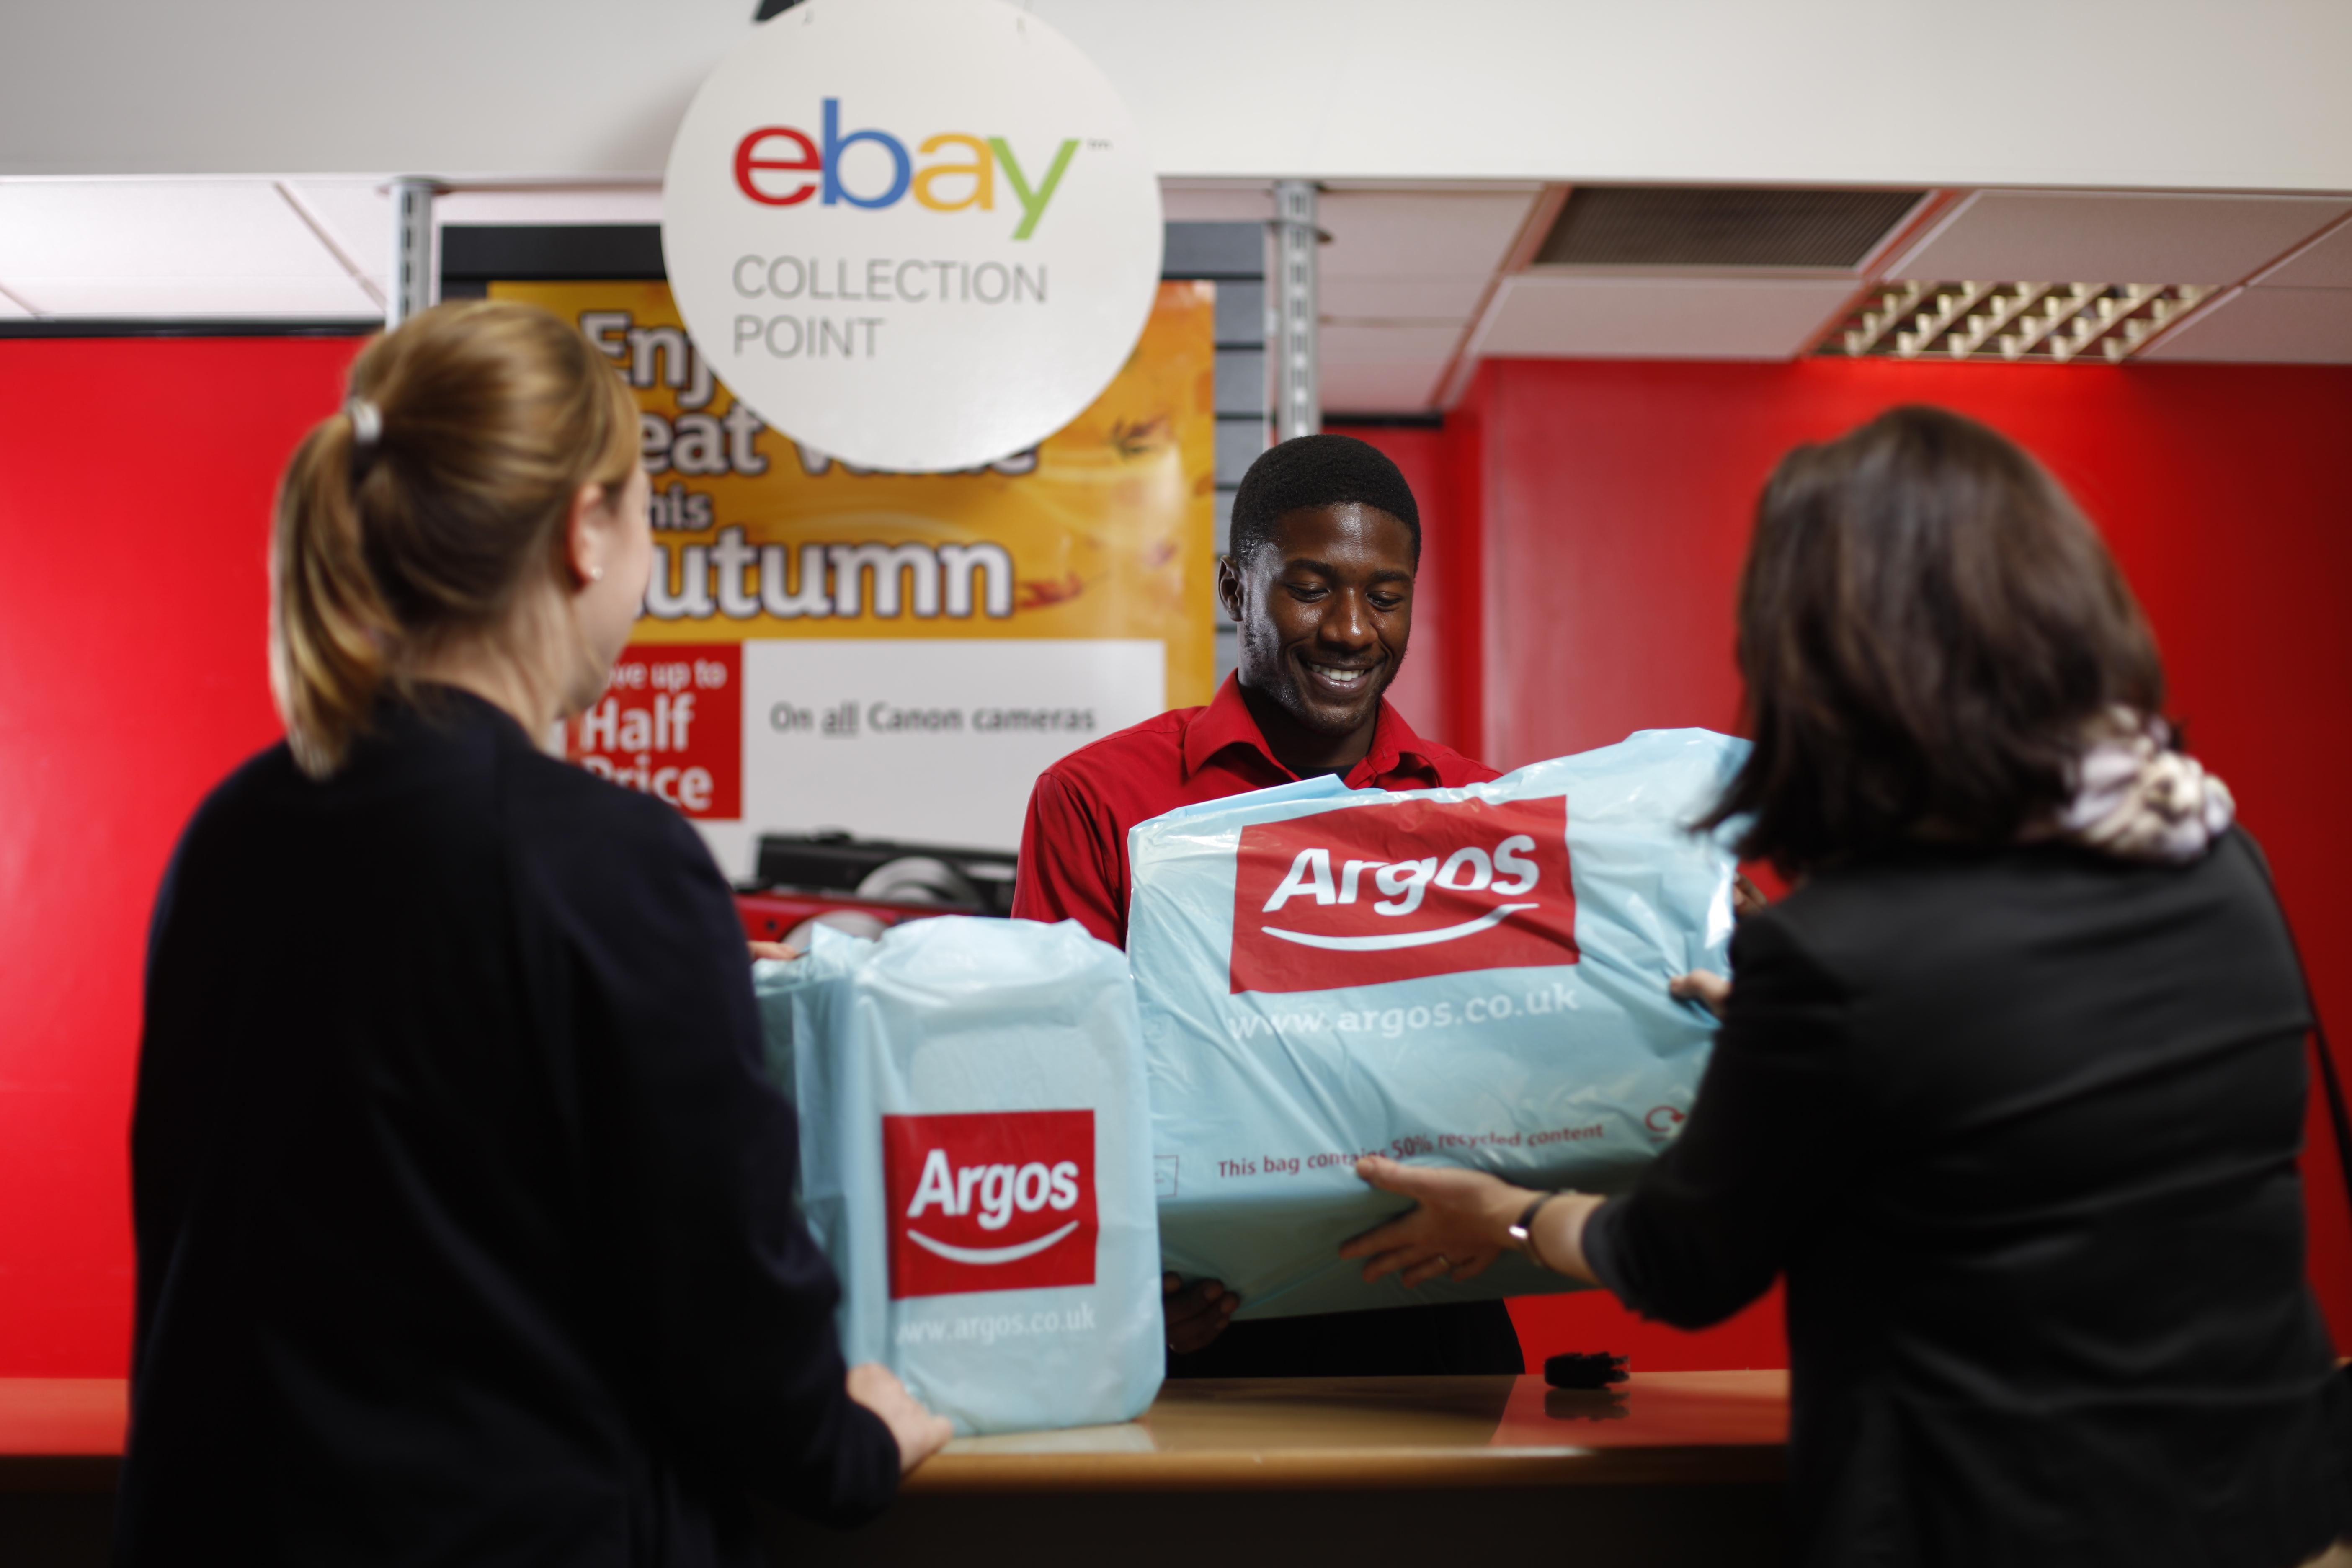 Argos and eBay to discontinue drop-off pilot